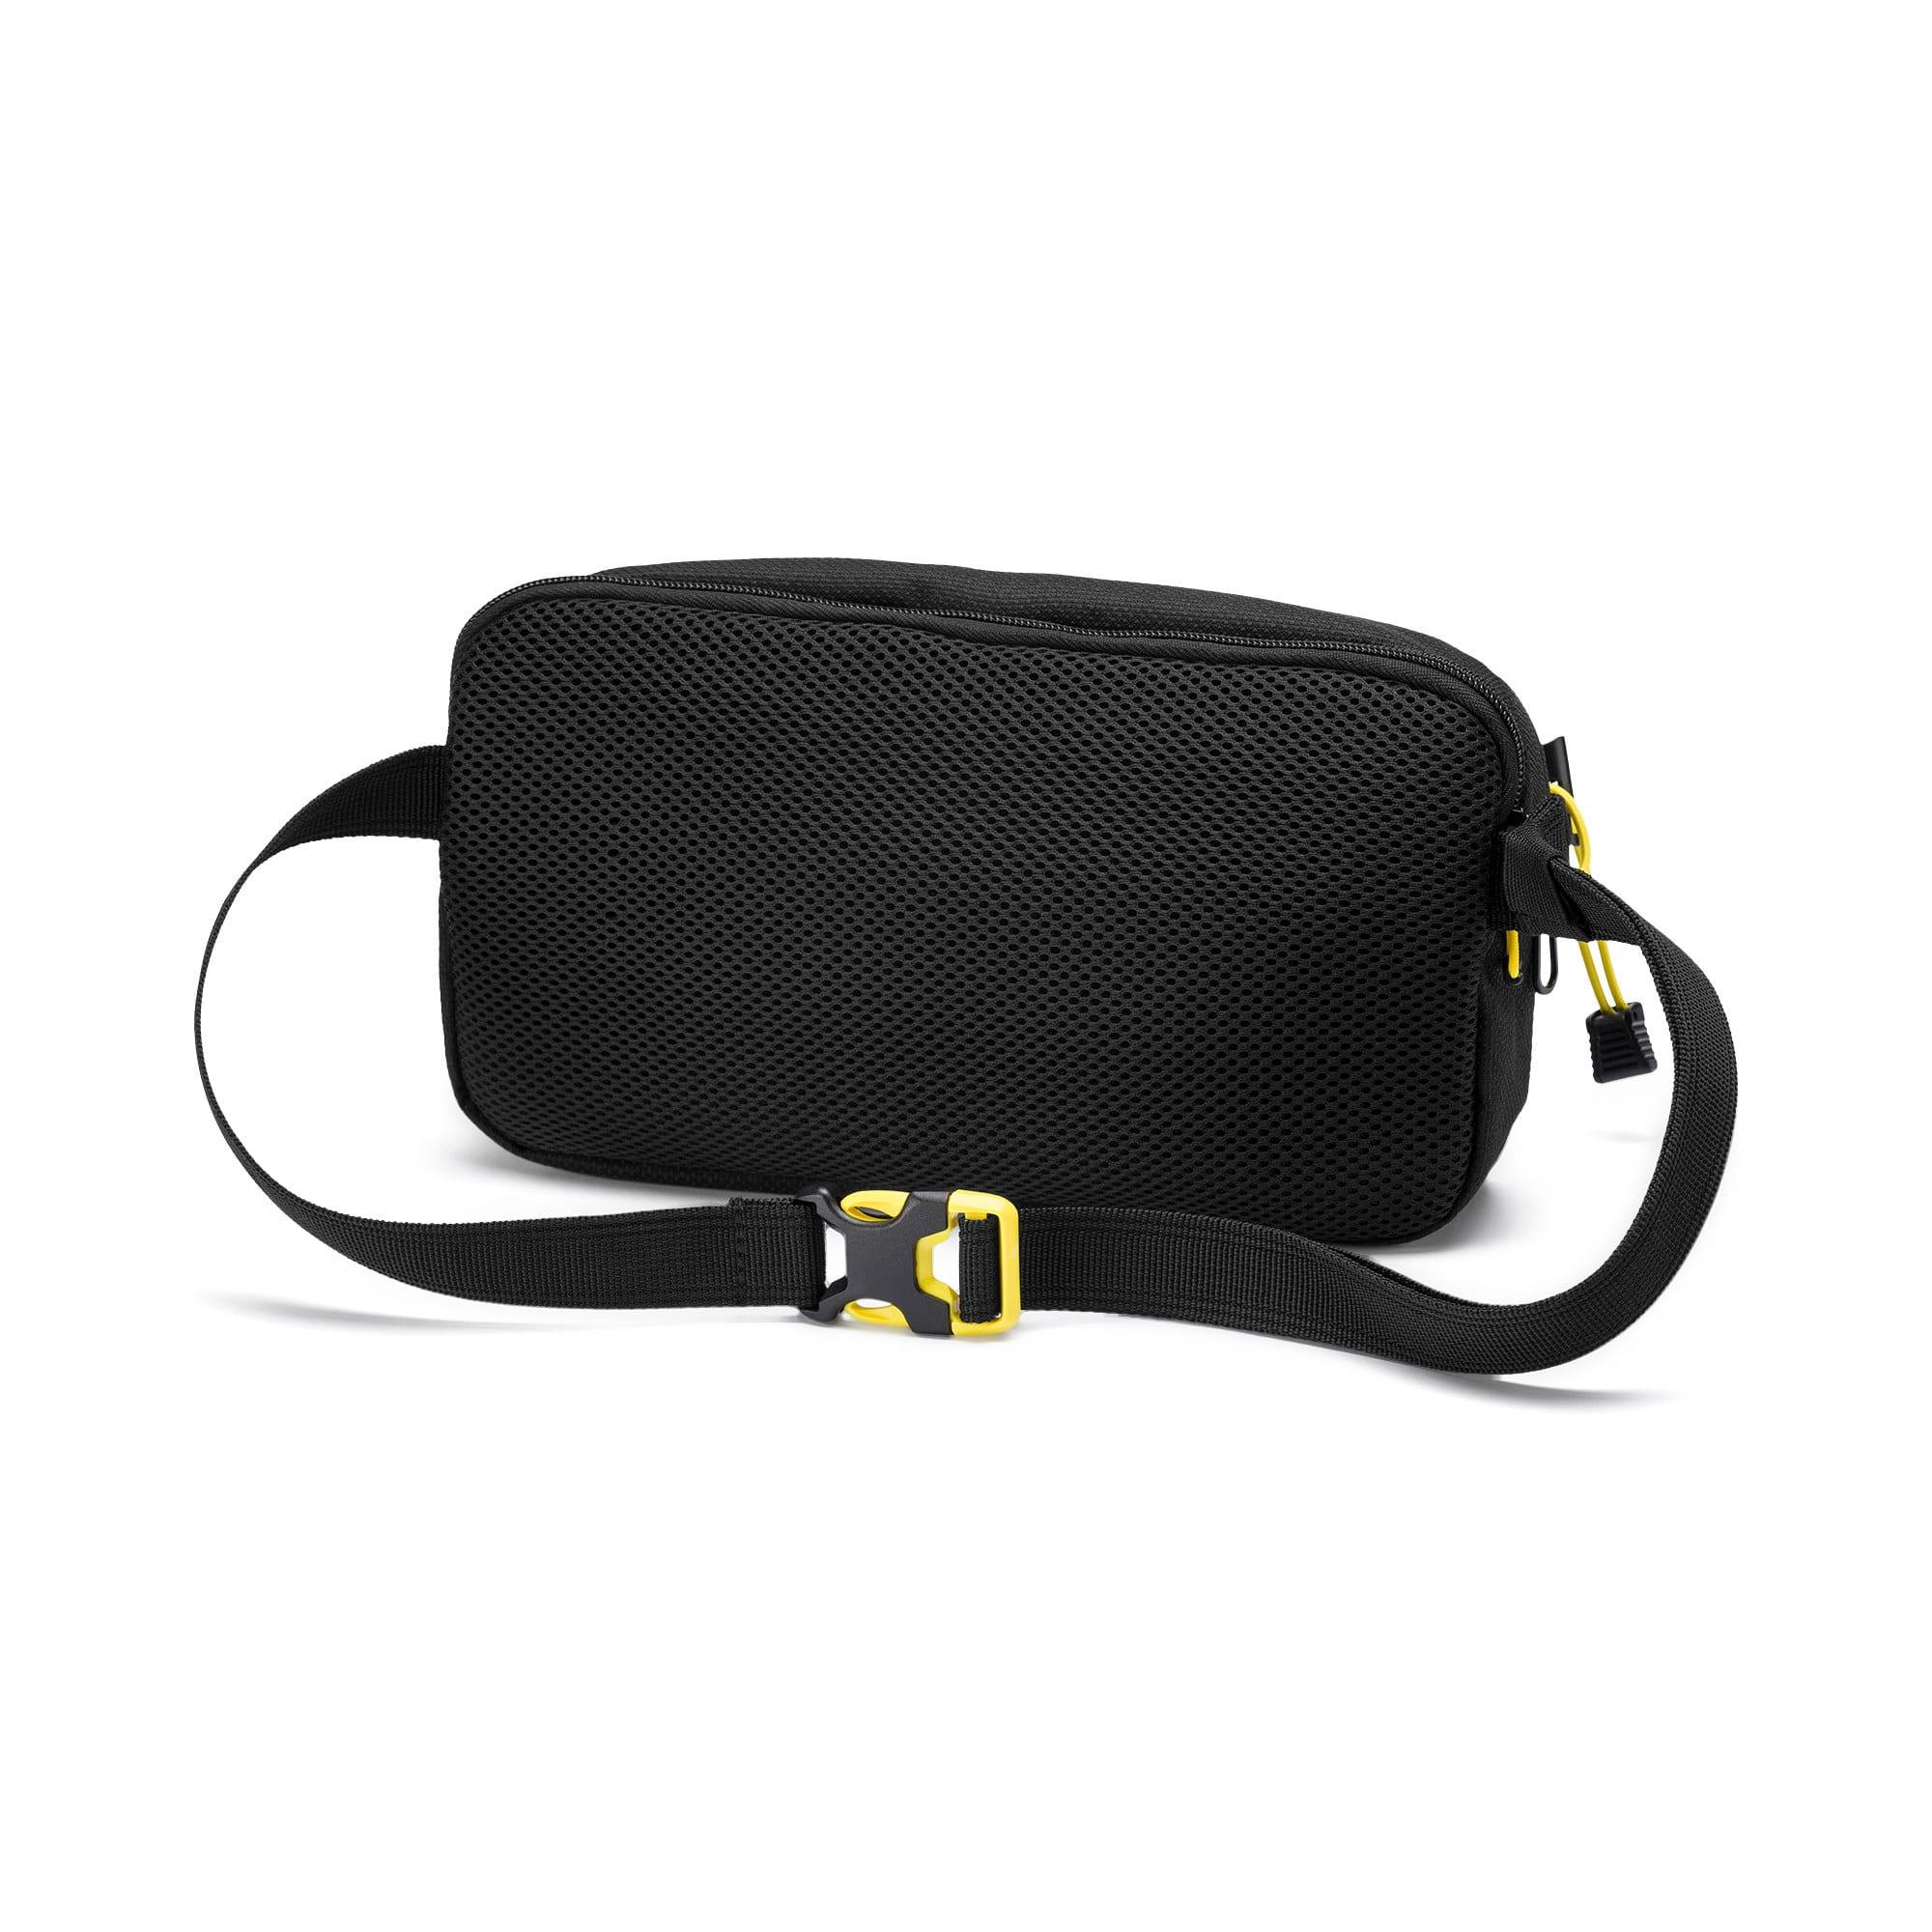 Thumbnail 2 of Ferrari Fanwear Waist Bag, Puma Black, medium-IND